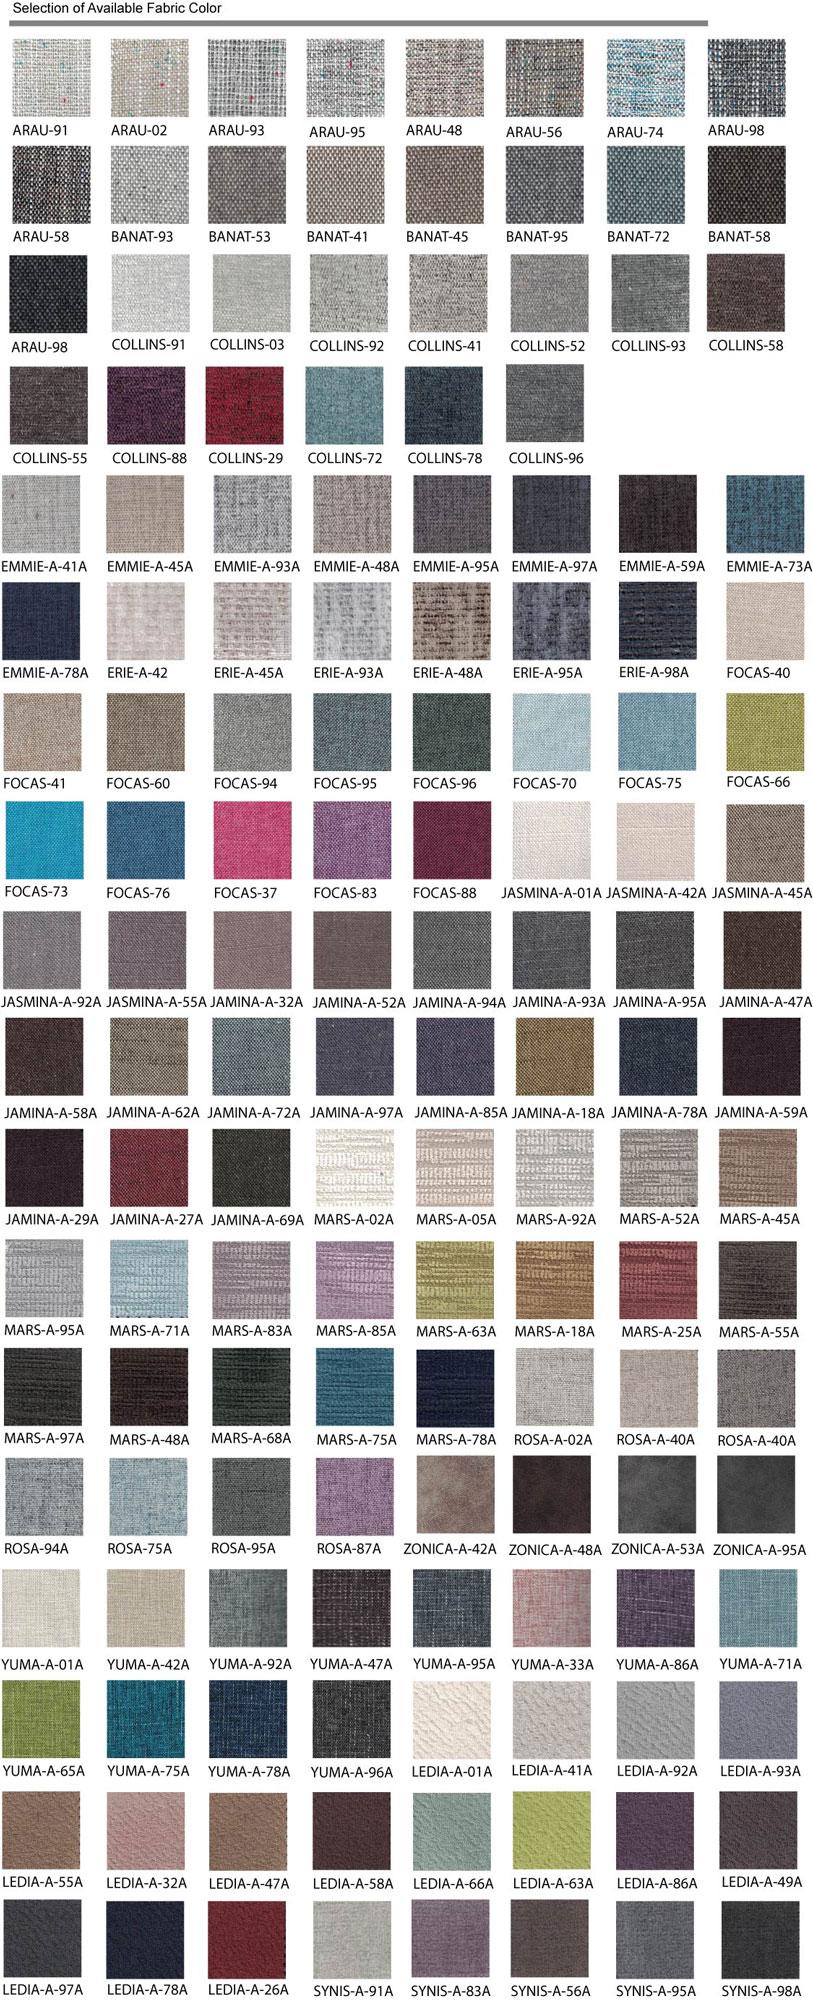 MZH Fabric